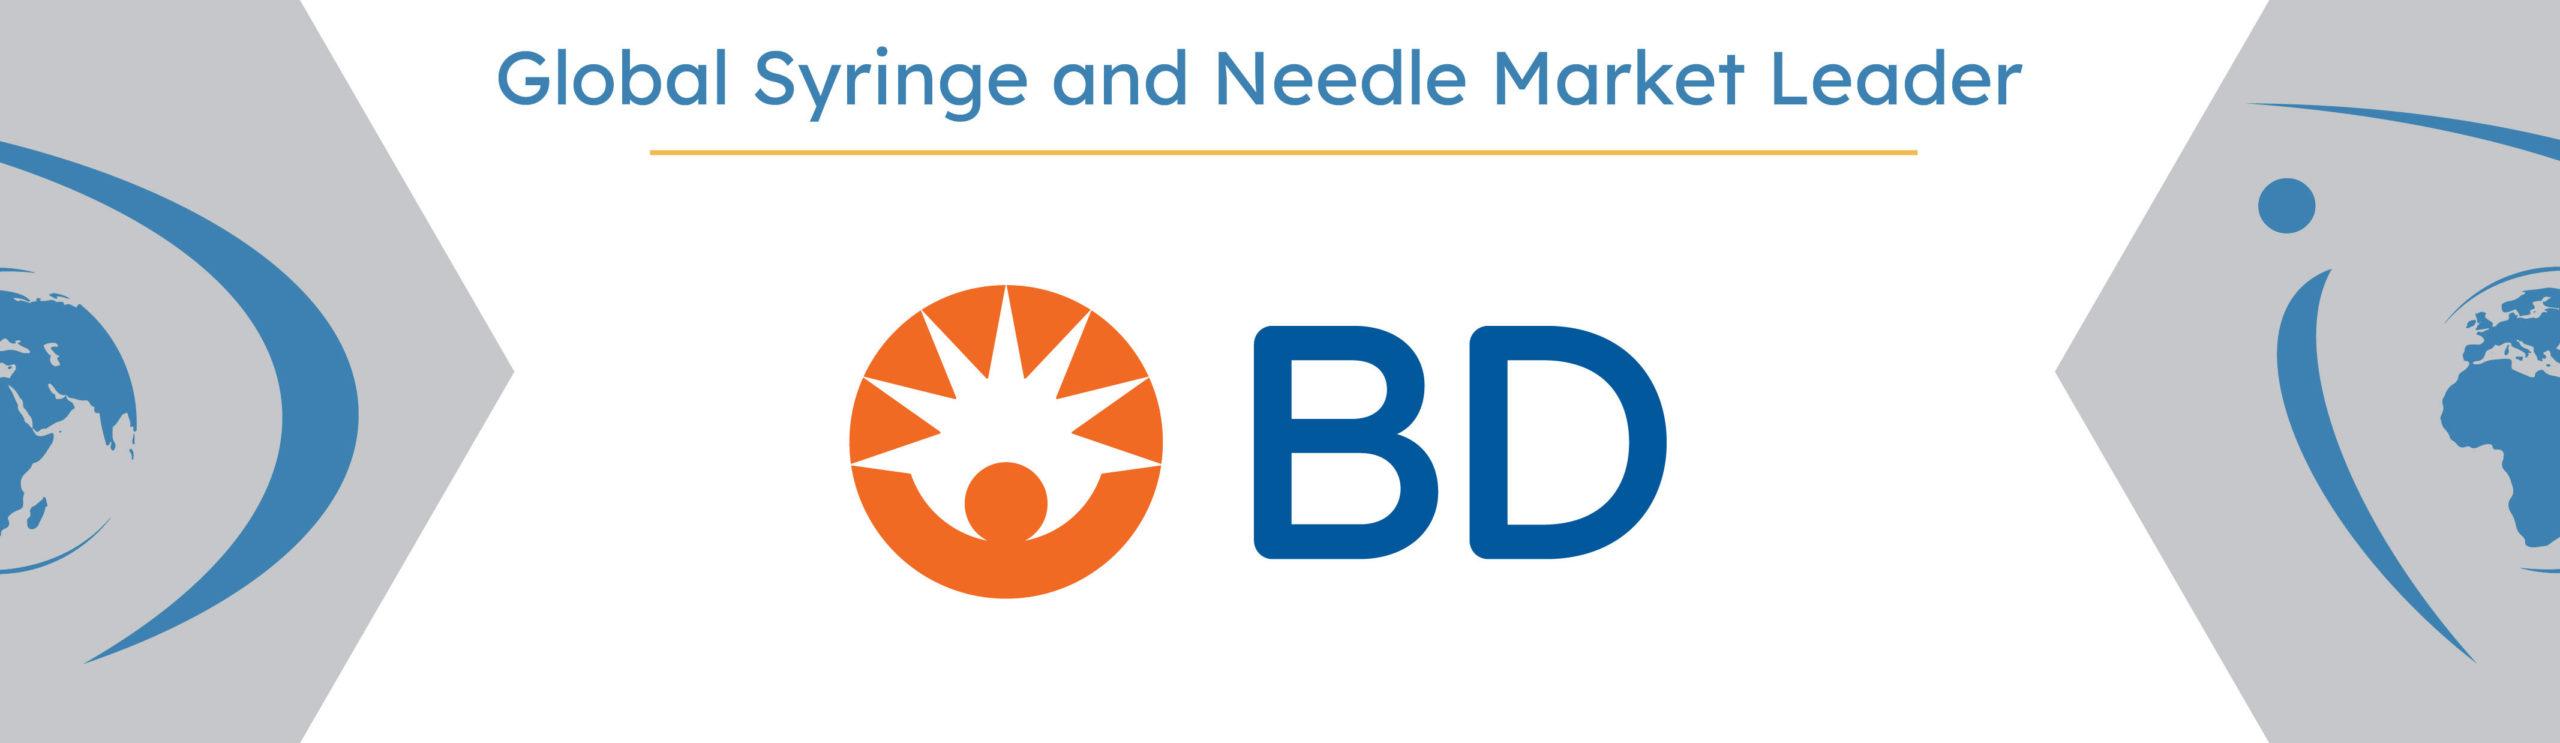 Global Syringe & Needle Companies